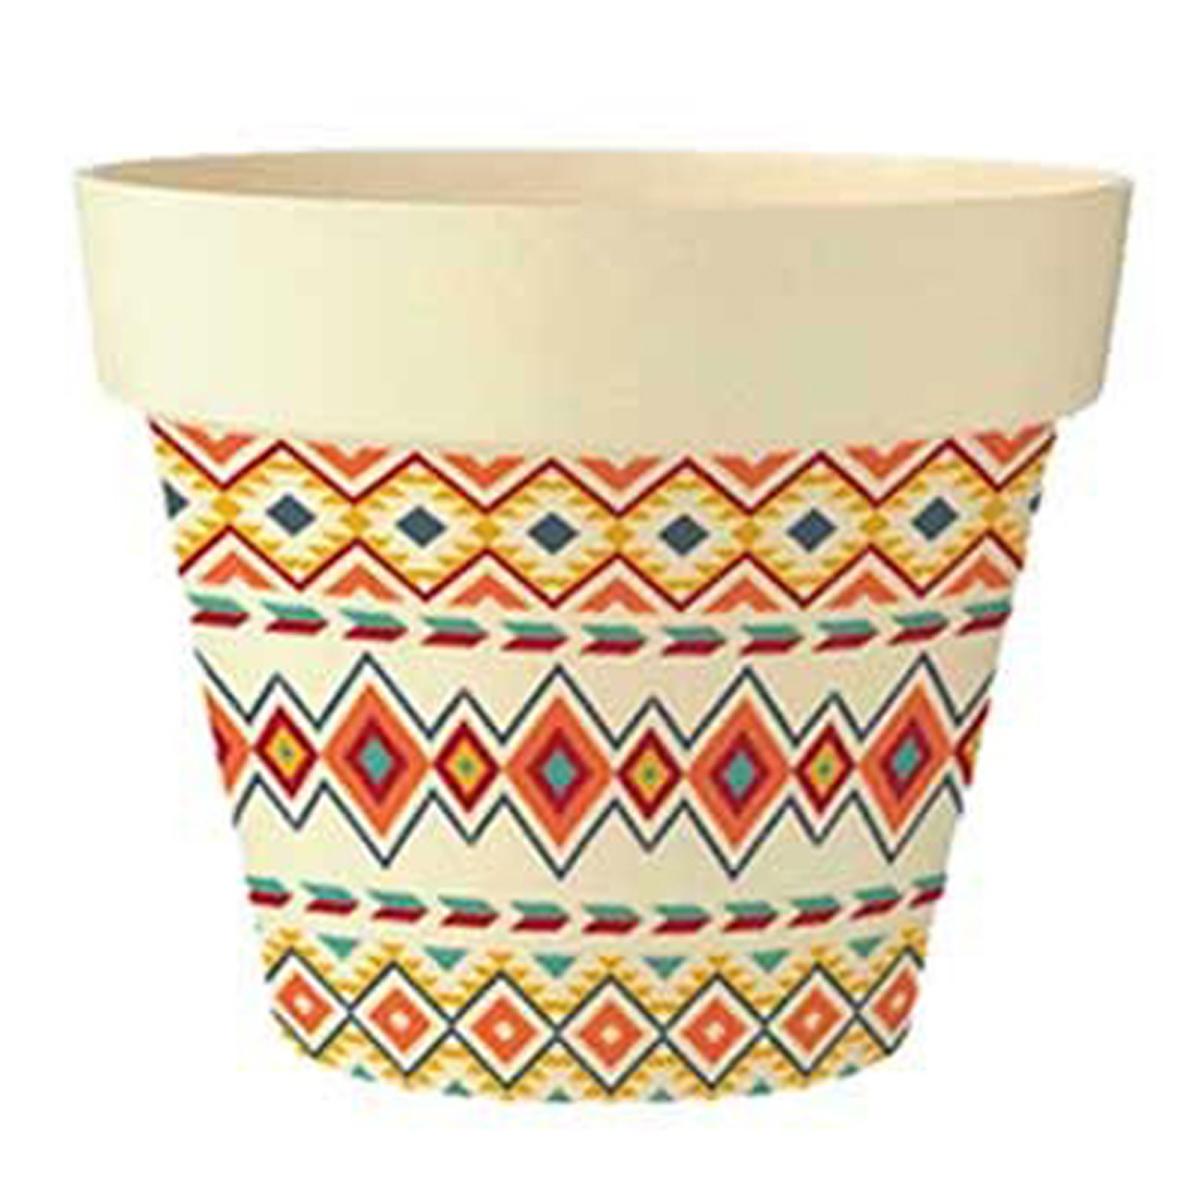 Cache-pot bambou \'Boho\' orange multicolore -  105x95 cm - [Q6418]